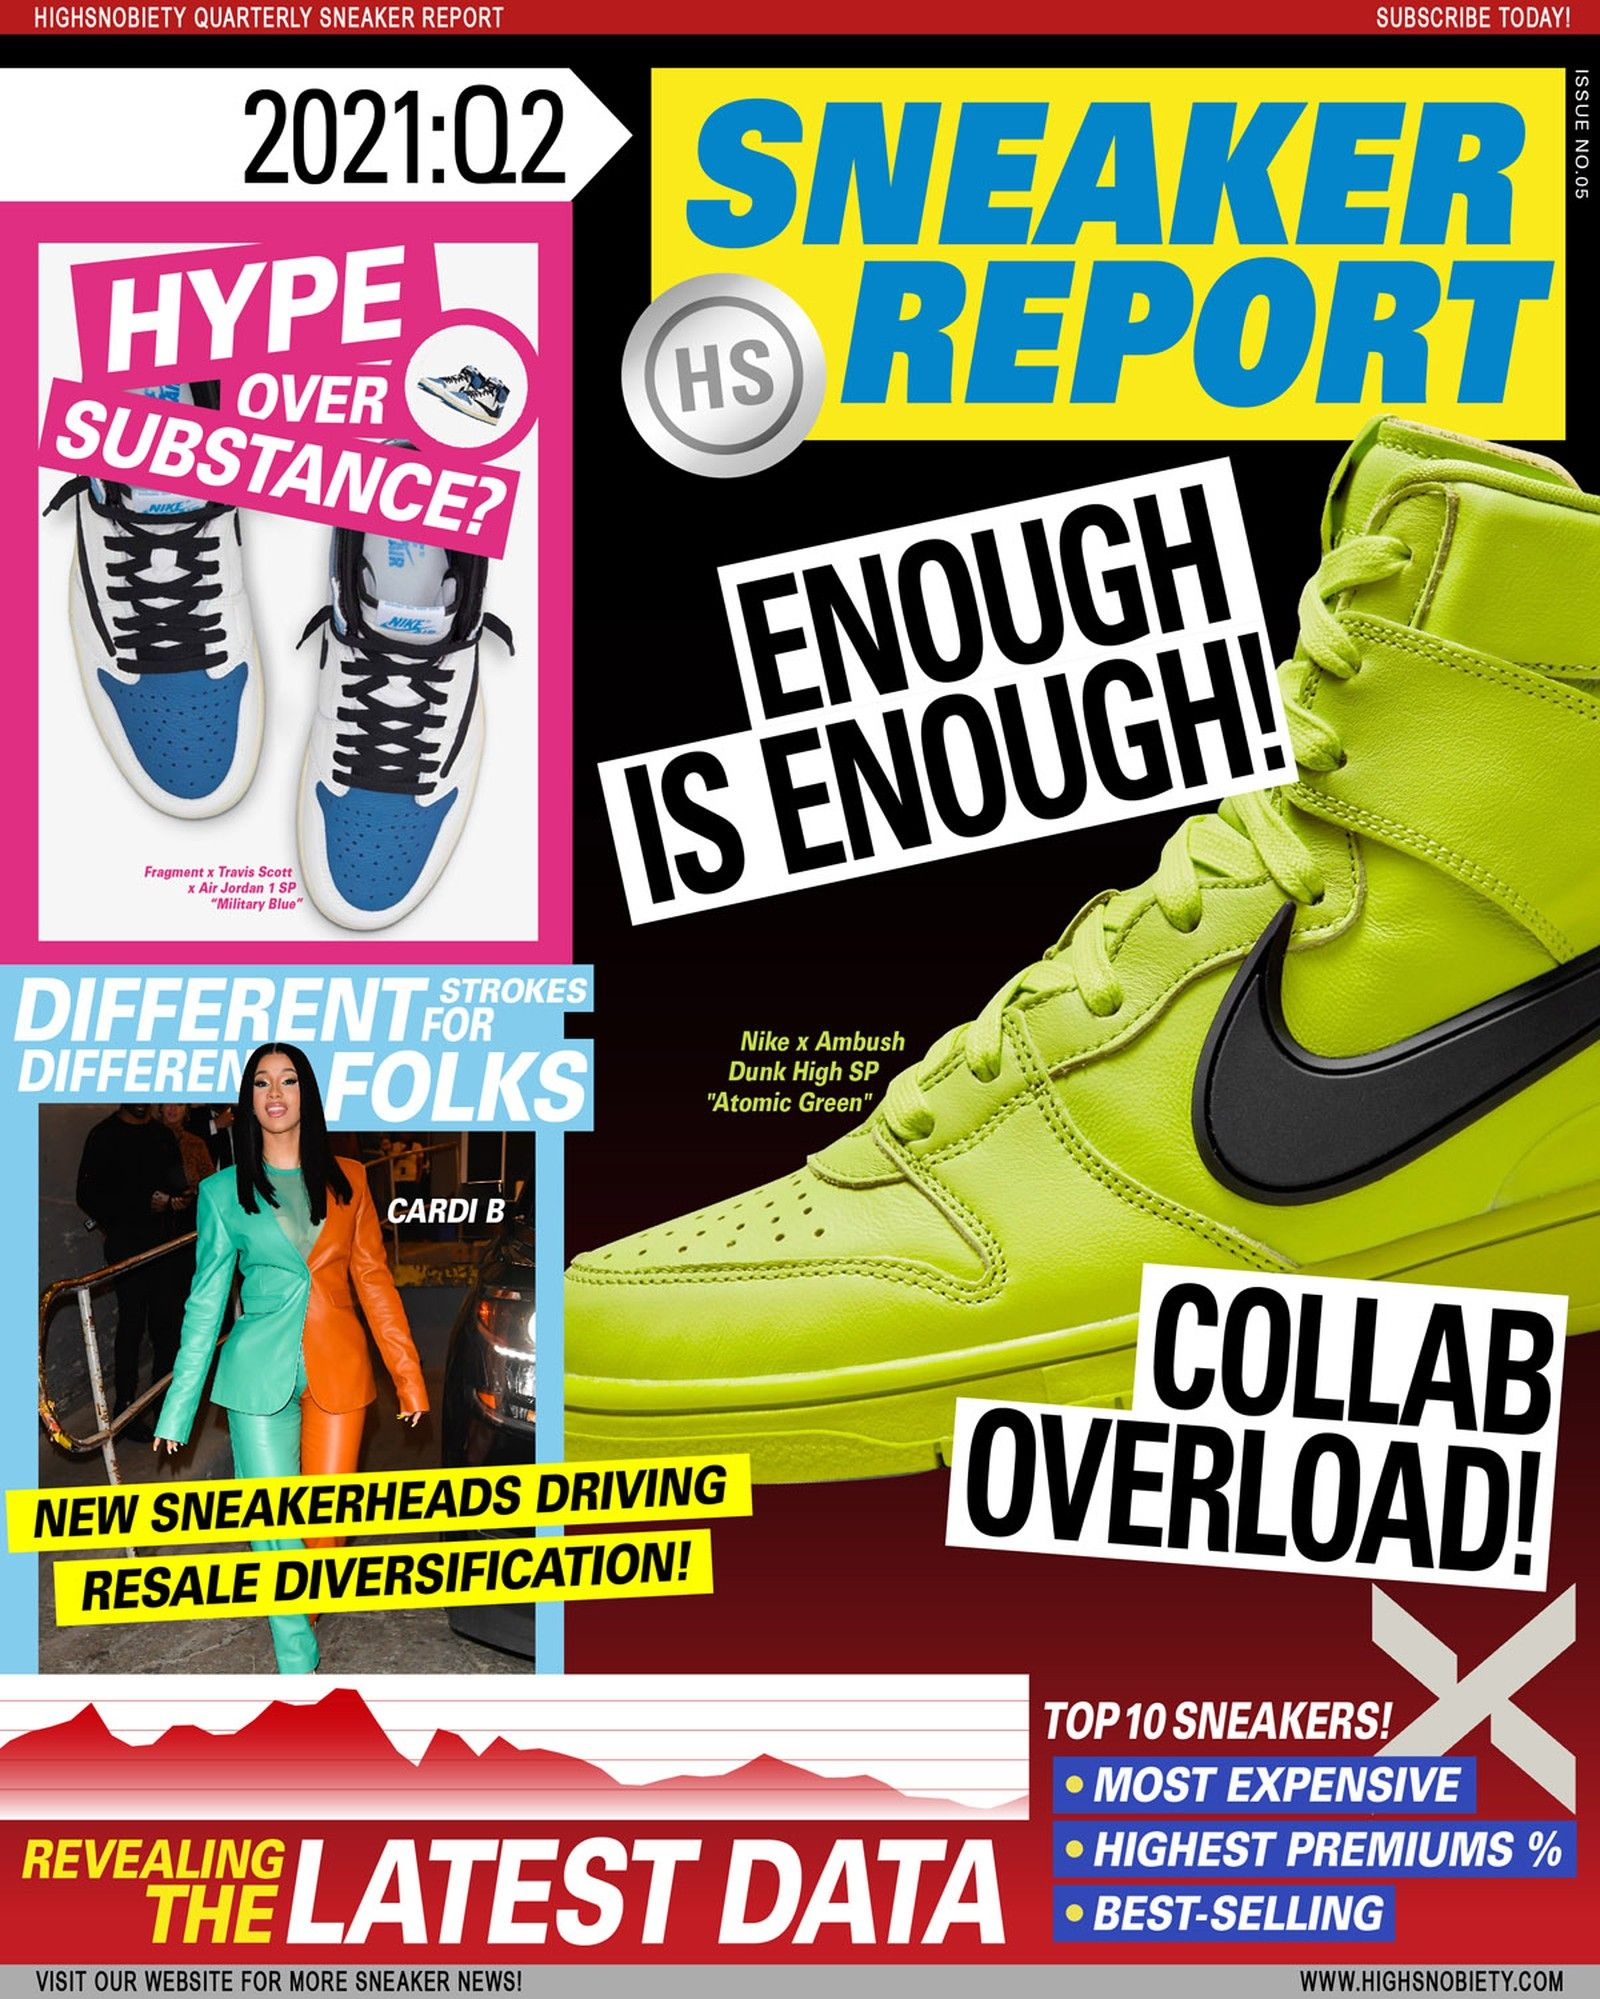 sneaker-report-q2-2021-feat